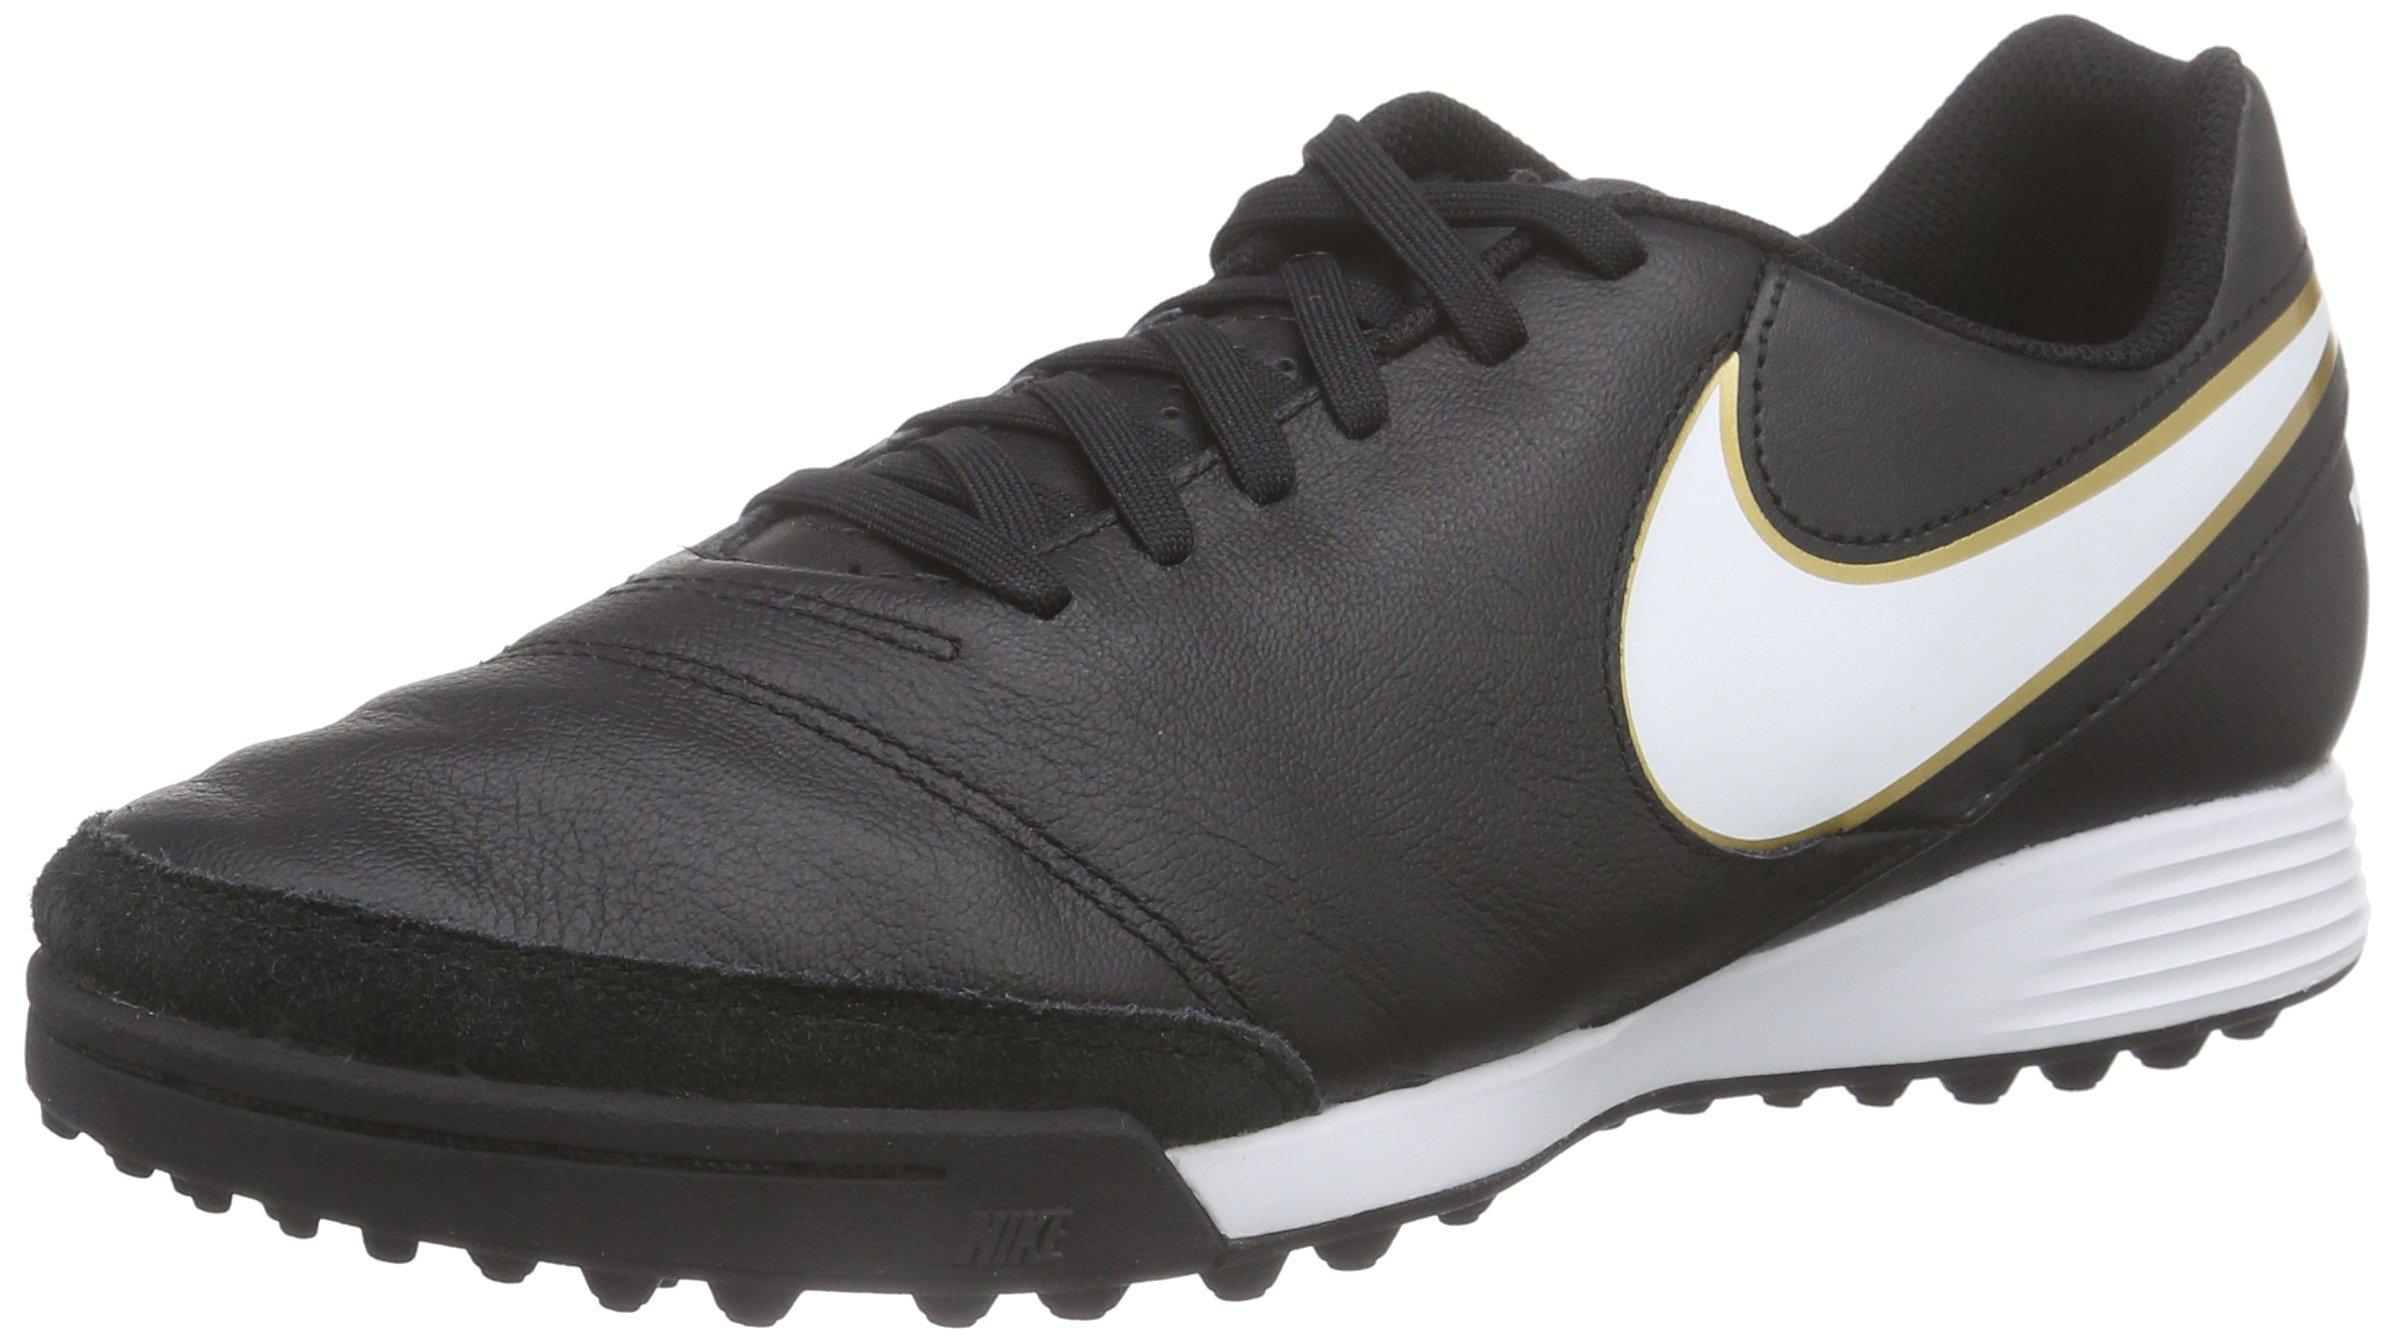 HommeNoirblack De Nike white Gold47 Eu metallic TfChaussures Genio Ii Tiempo Football nOk8PX0w